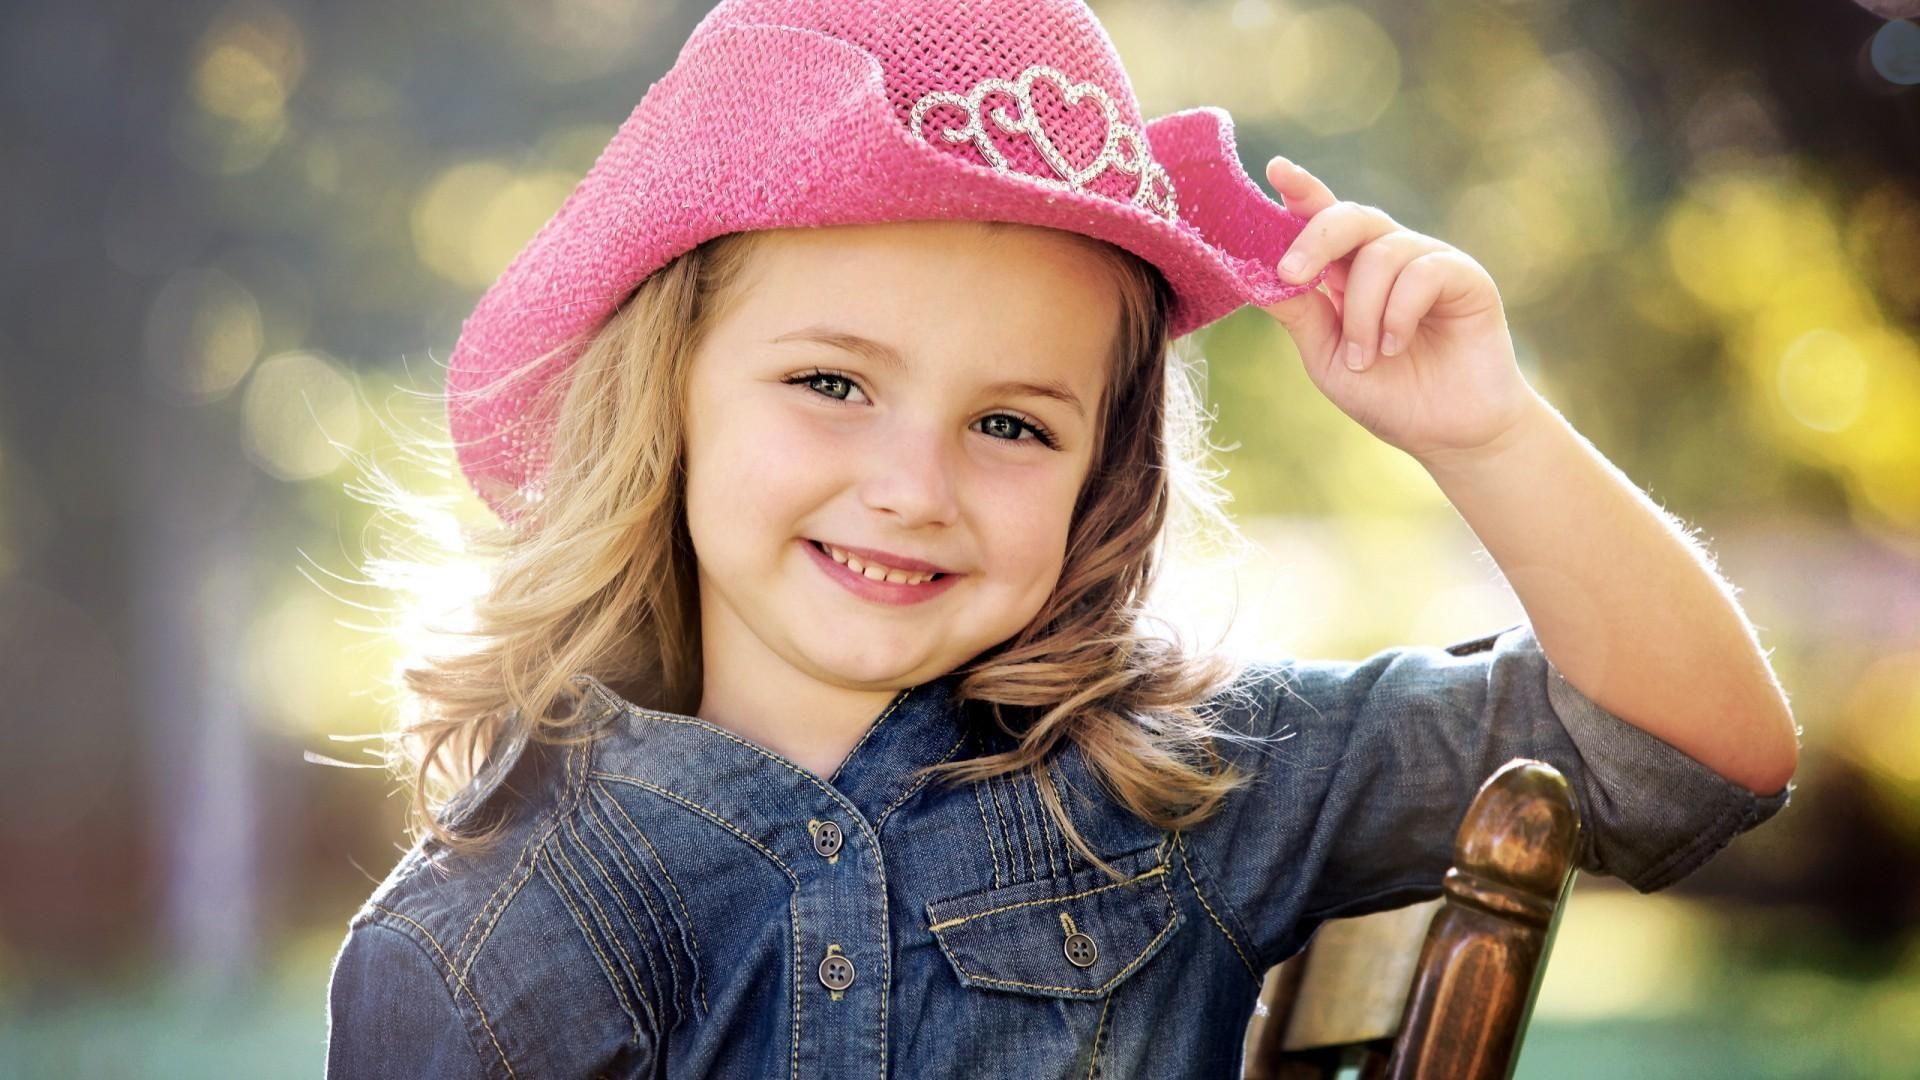 All Hd Wallpapers Net Baby Girl Wallpaper Cute Baby Wallpaper Cute Small Girl